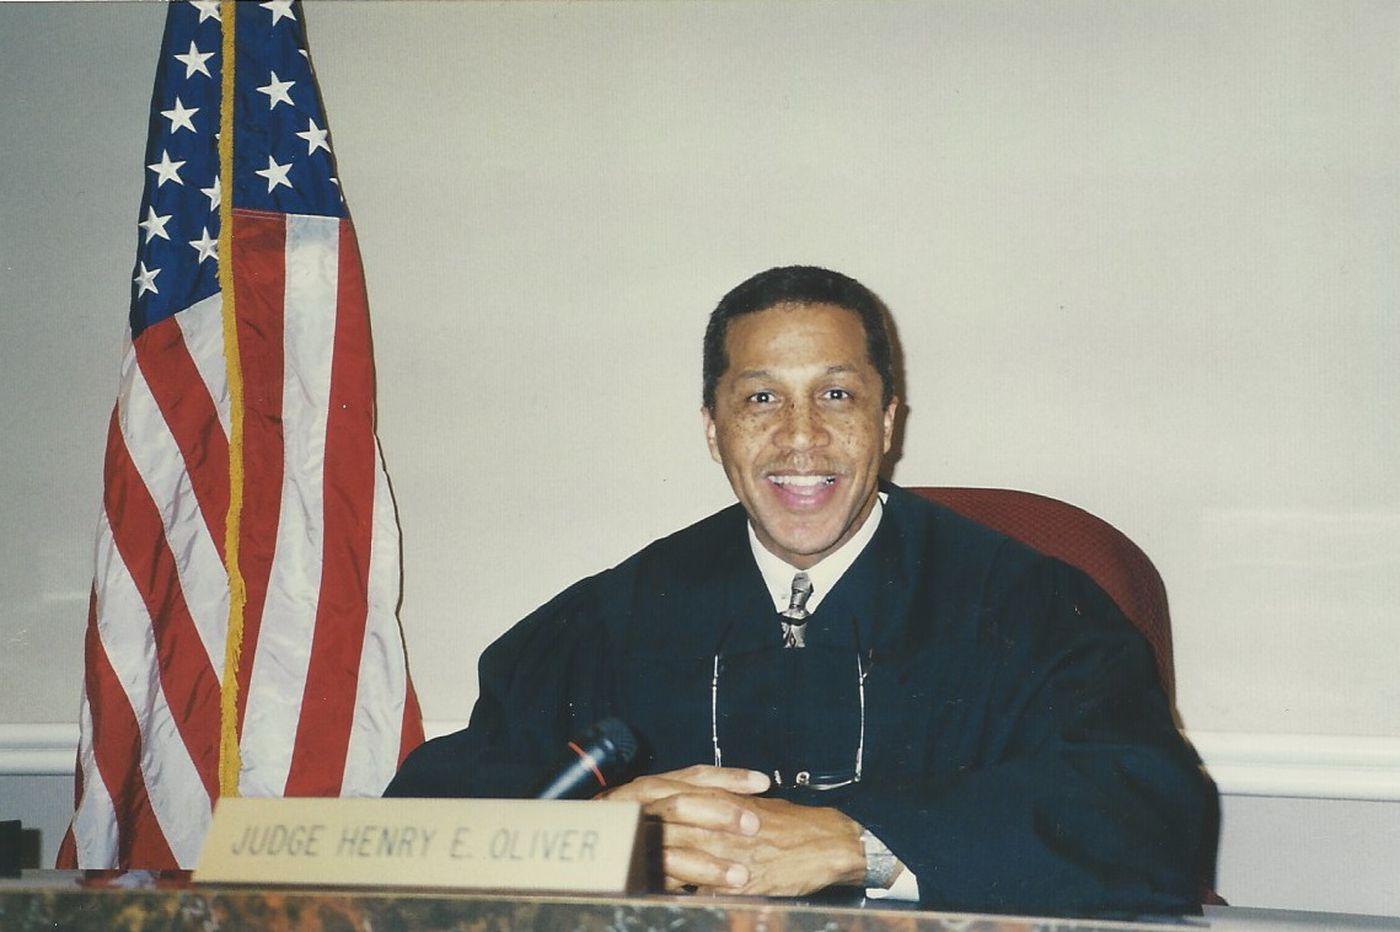 Henry E. Oliver, 77, administrative law judge